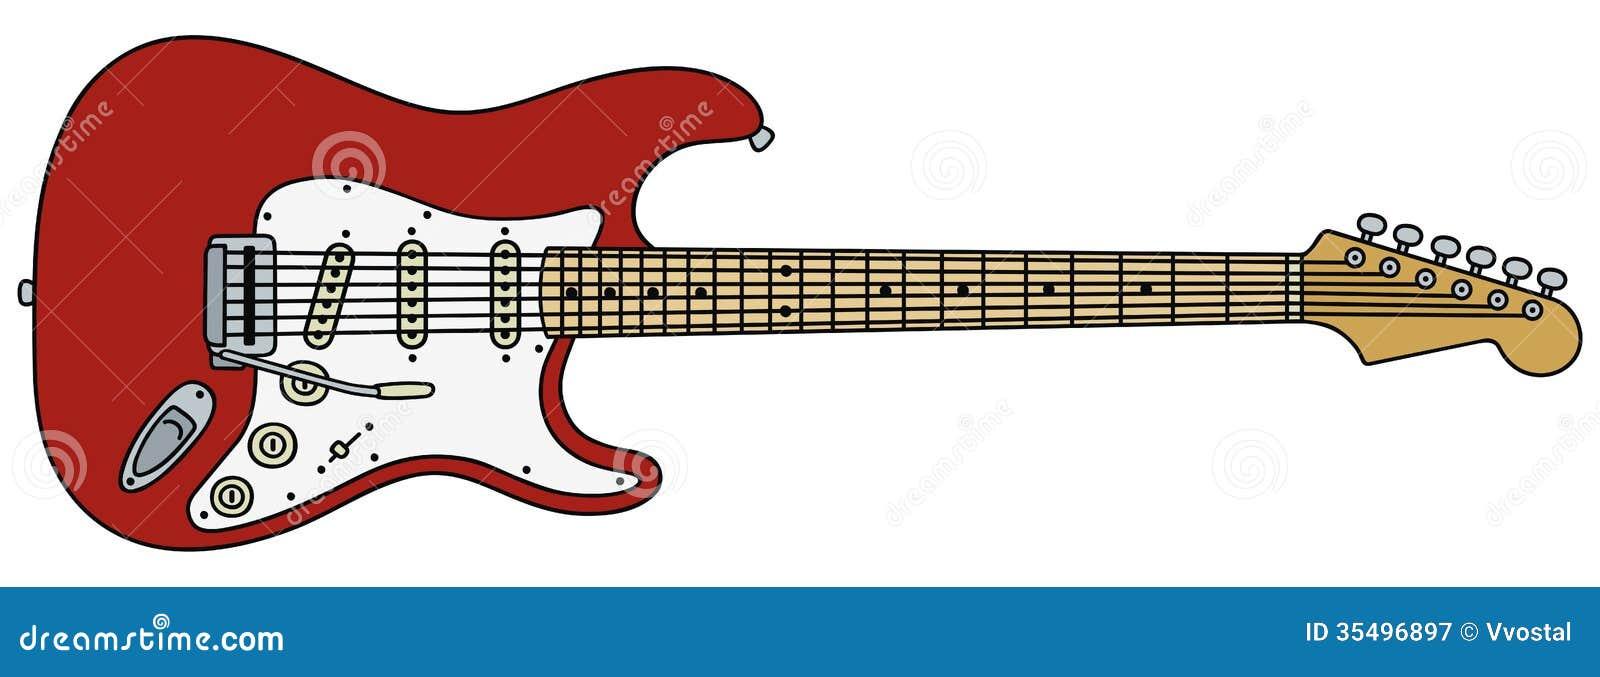 E-Gitarre vektor abbildung. Illustration von land, jazz - 35496897